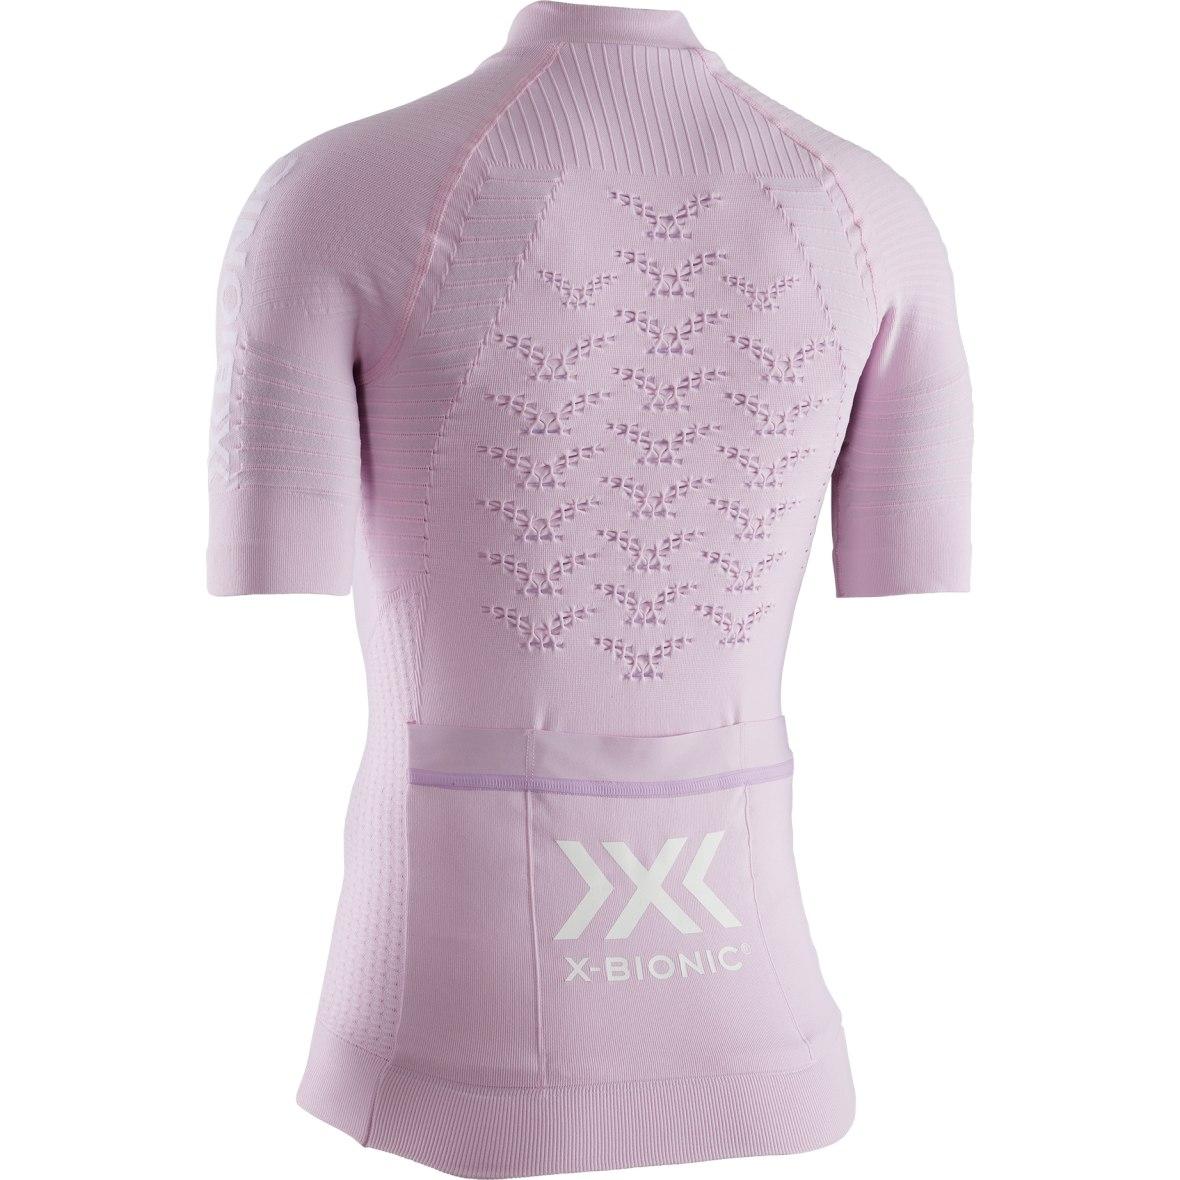 Bild von X-Bionic Effektor 4.0 Bike Full Zip Kurzarmtrikot für Damen - magnolia purple/arctic white